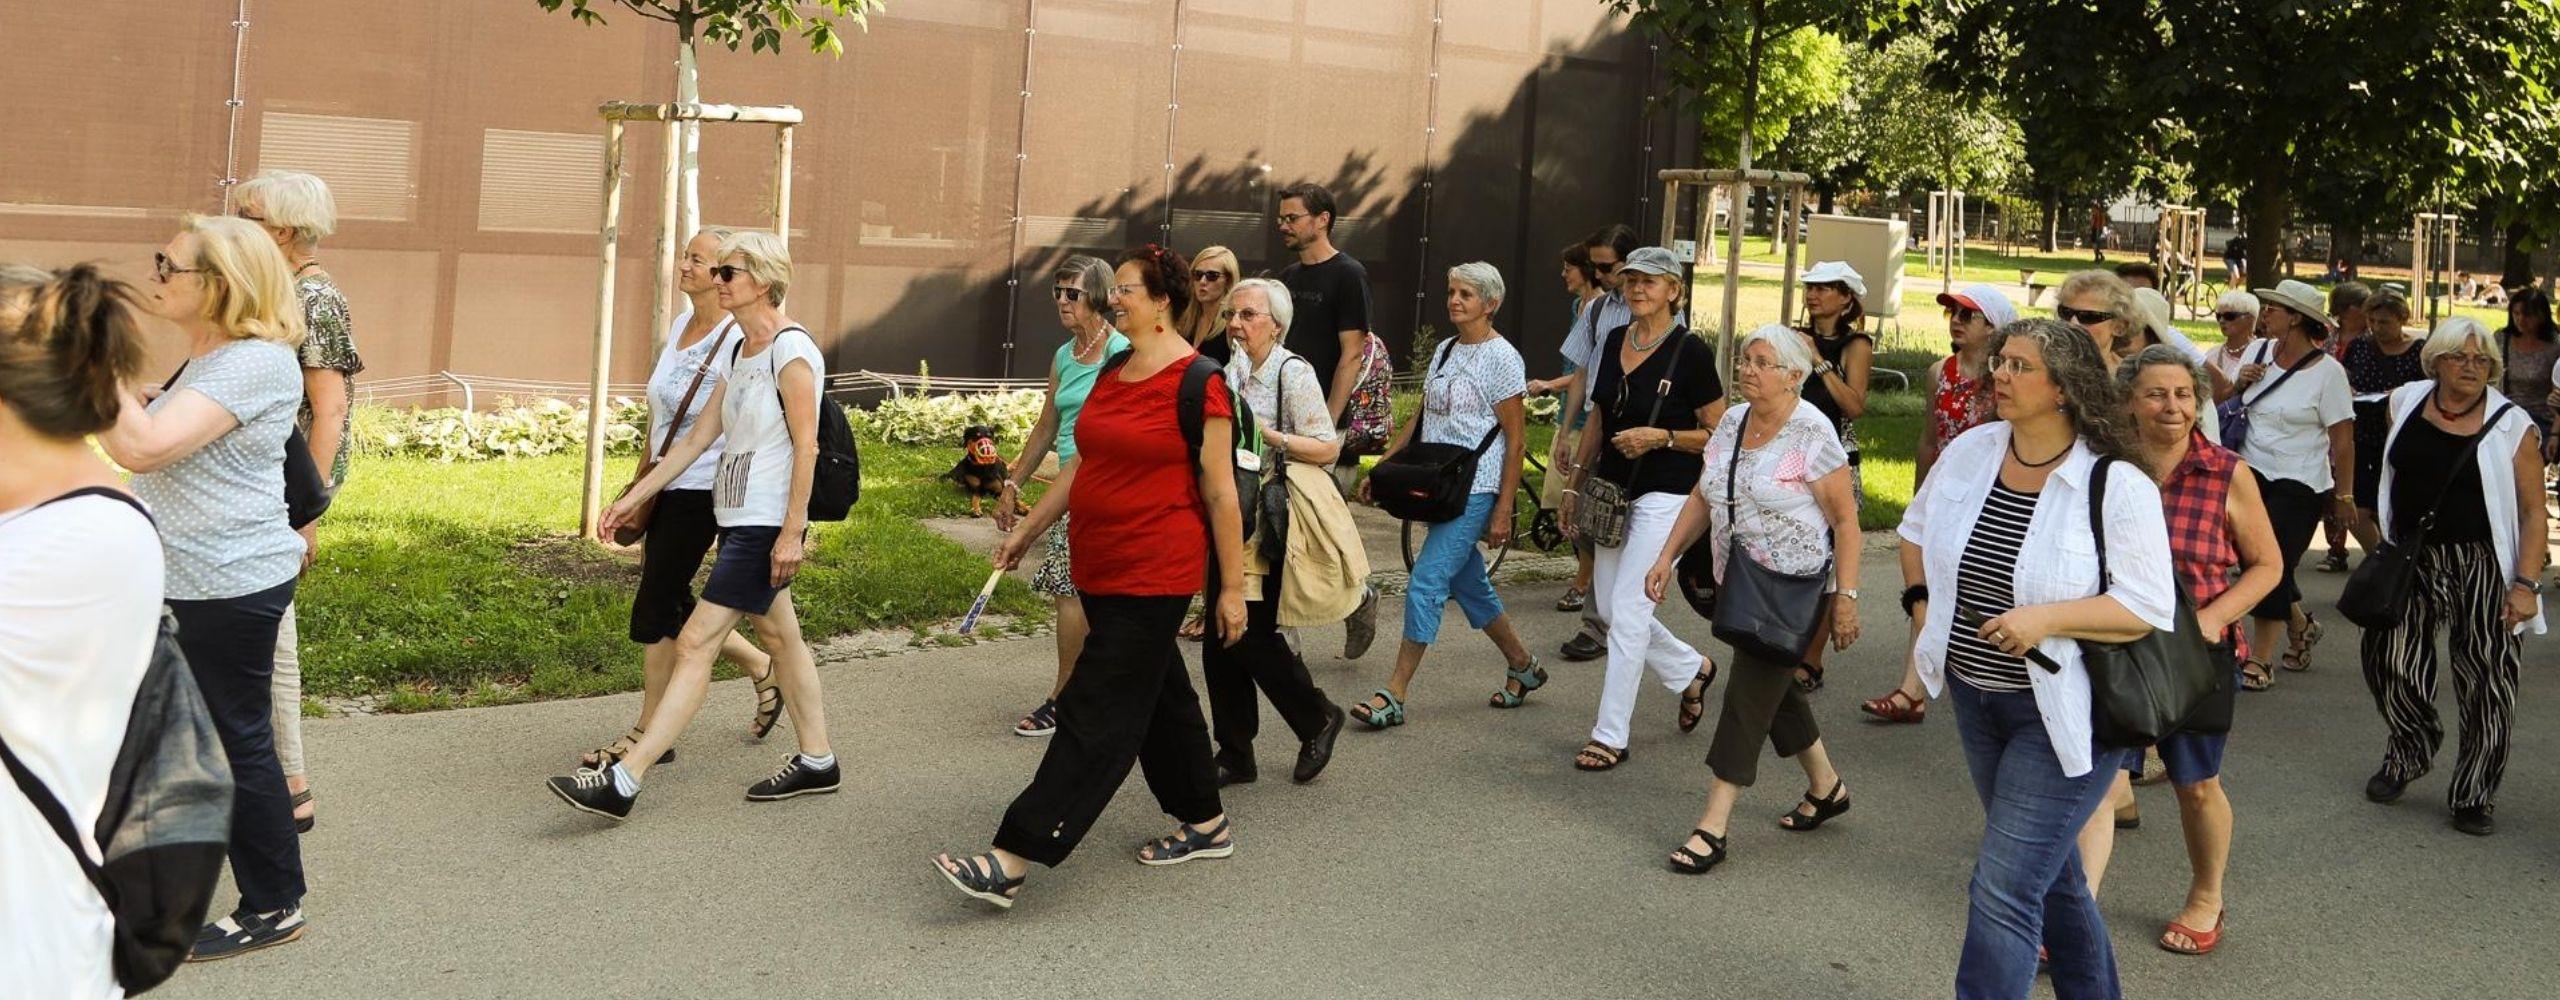 Menschengruppe beim Rundgang am Heldenplatz